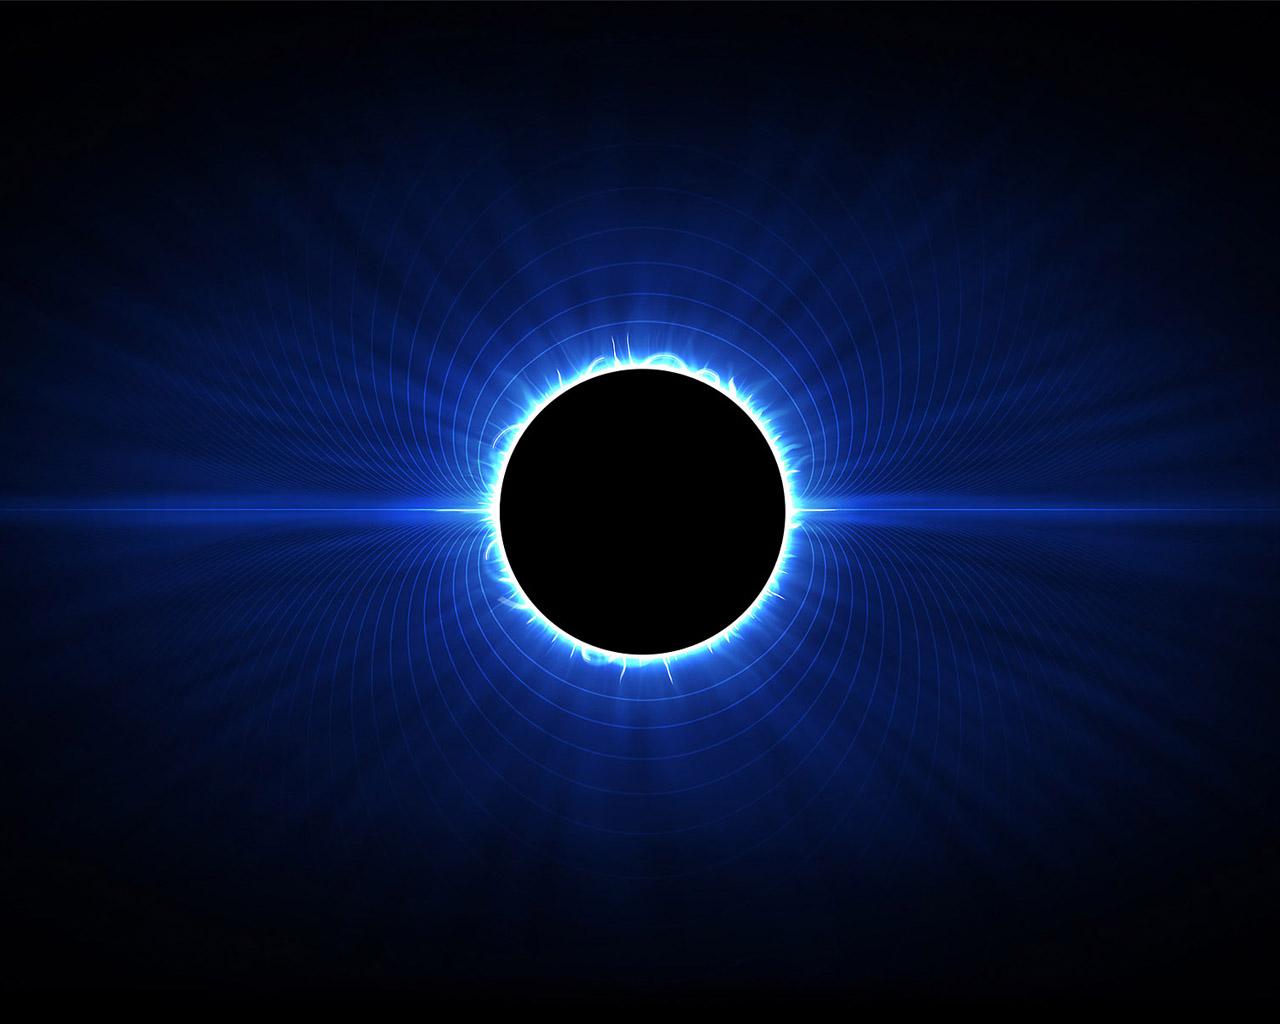 Solar eclipse Desktop wallpapers 1280x1024